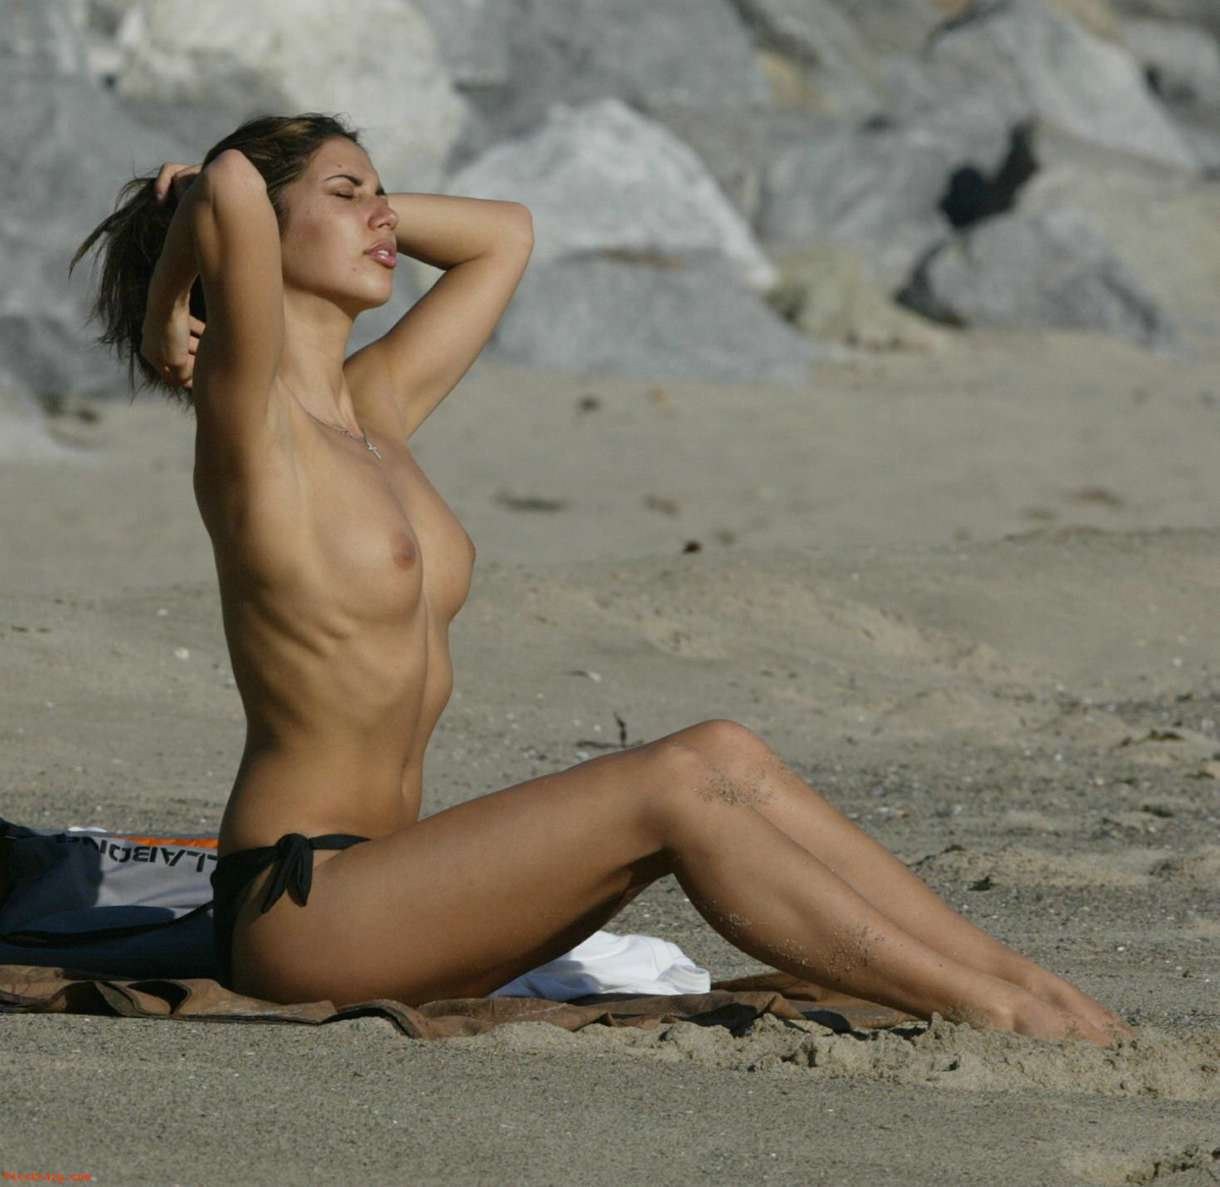 Agree Nicole sherzinger nude pics the question